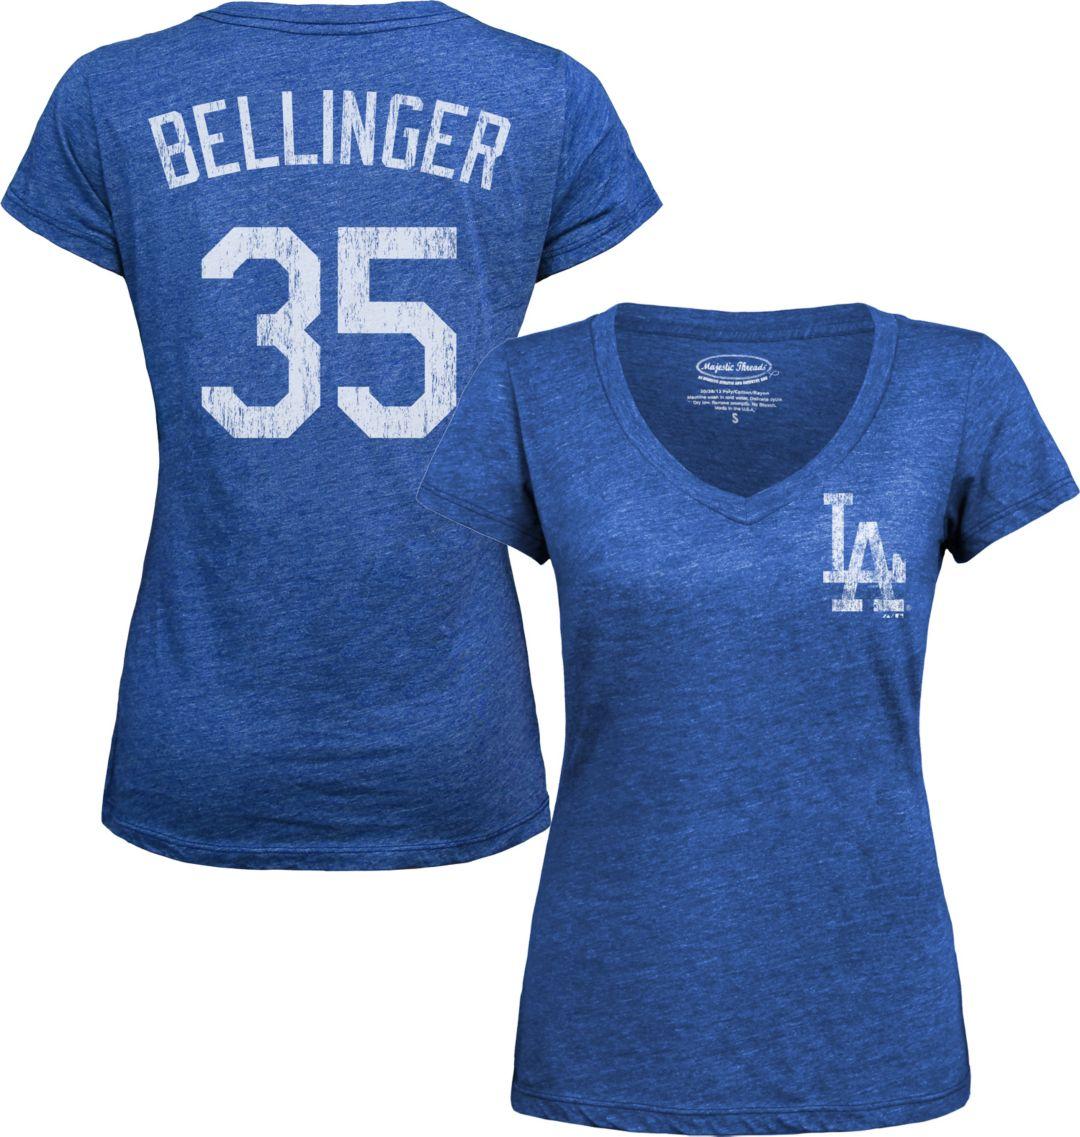 fa122524 Majestic Threads Women's Los Angeles Dodgers Cody Bellinger Royal V-Neck  T-Shirt